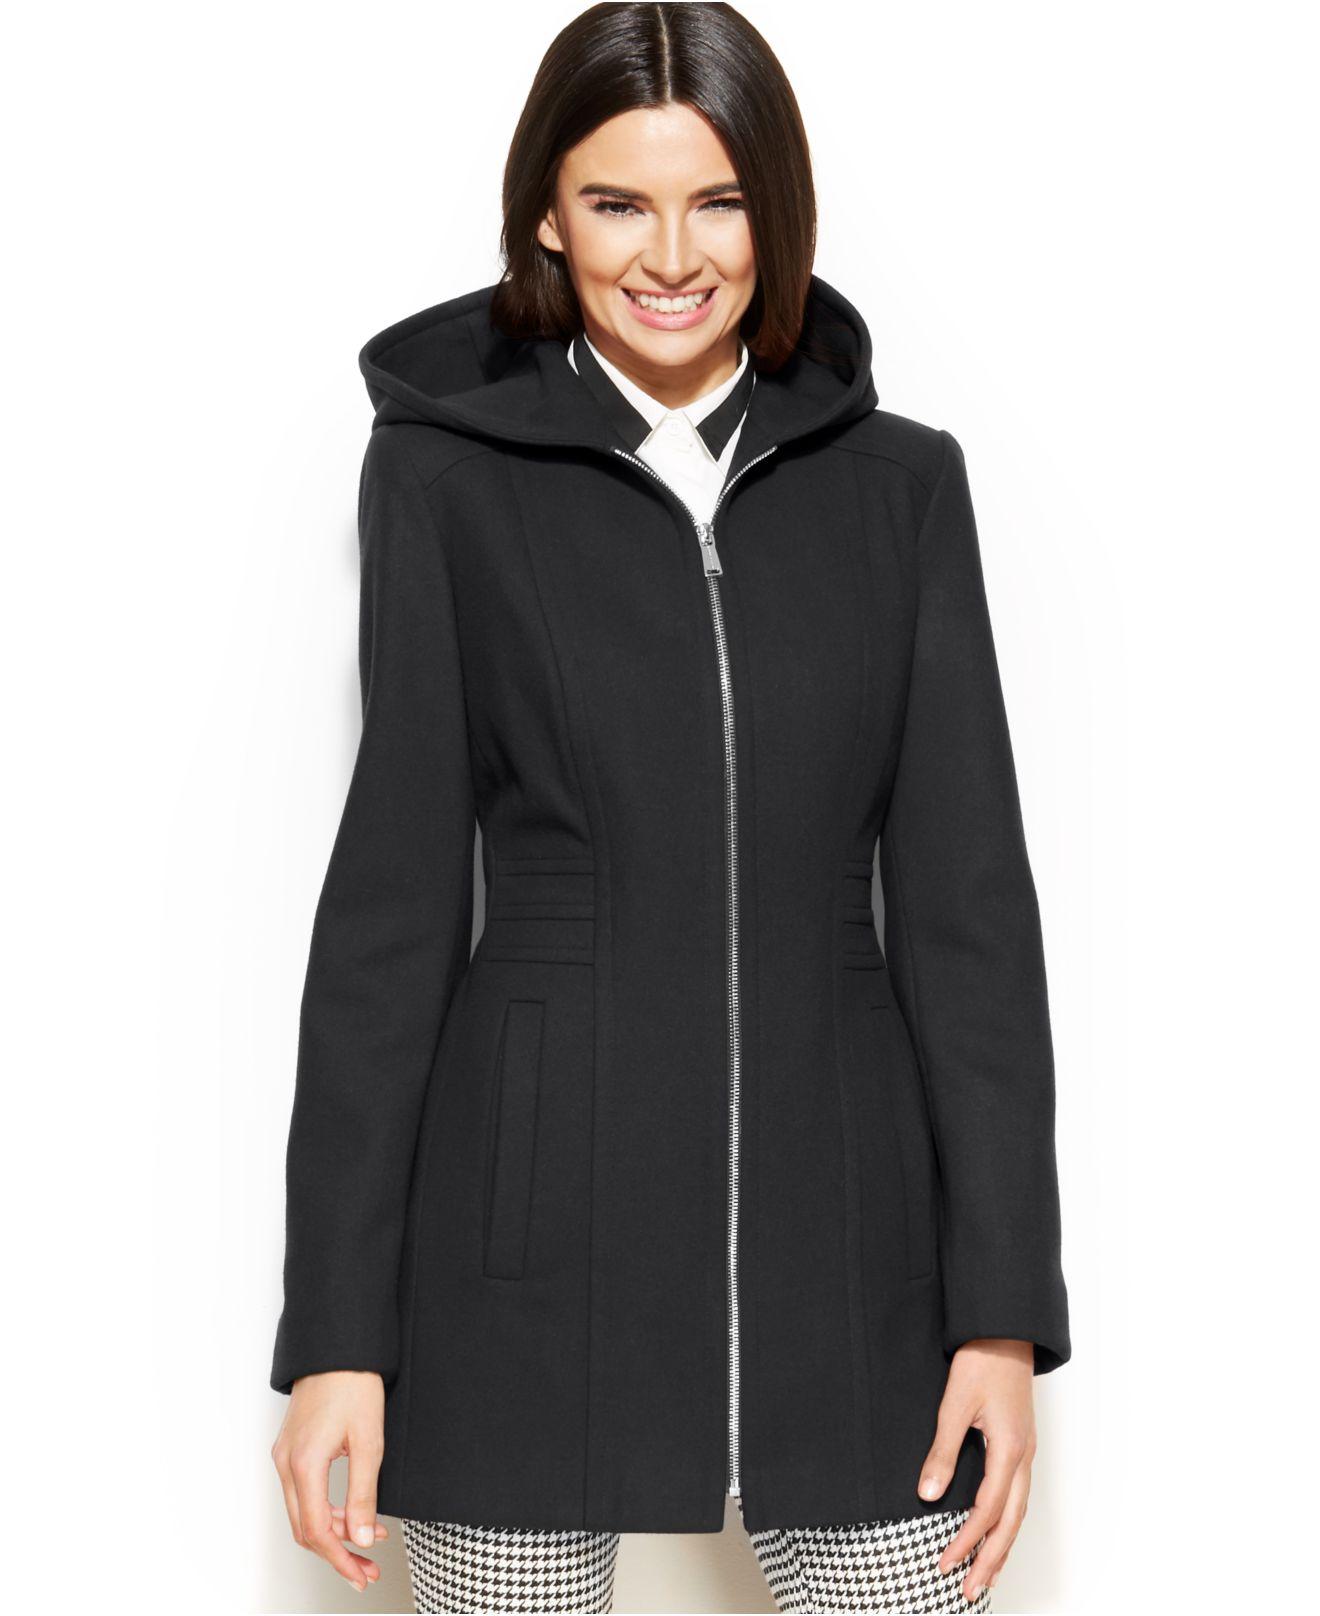 pea coat womens with hood coat racks